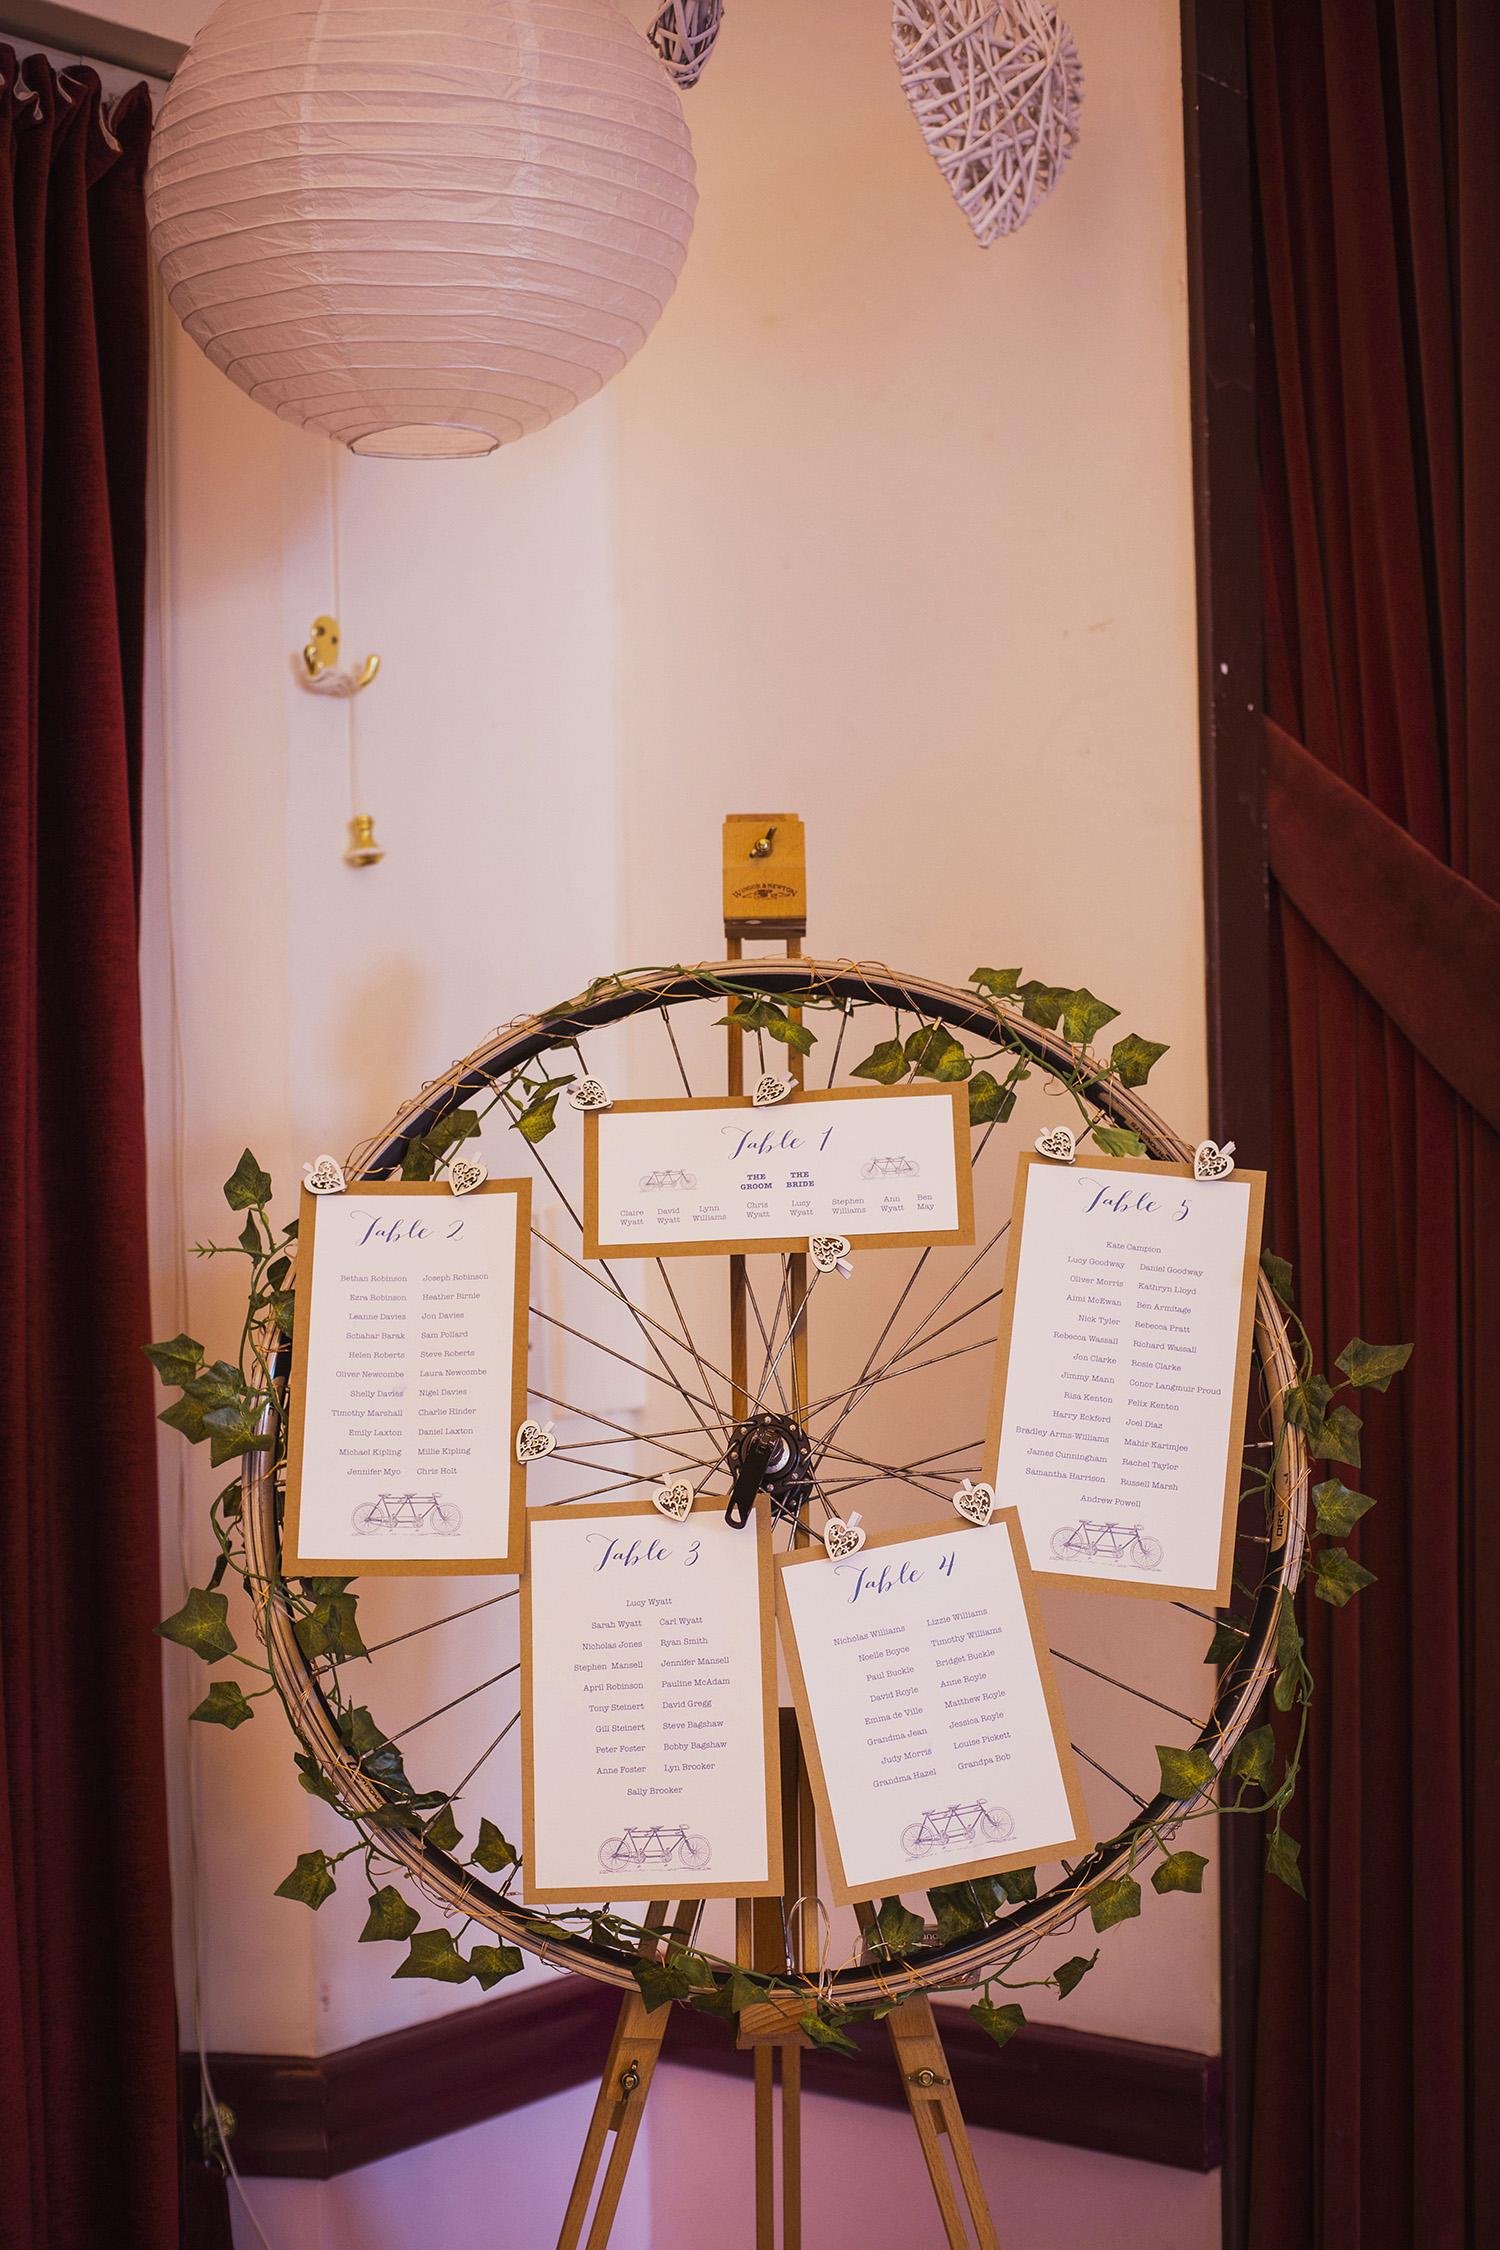 table plan at fentham hall diy wedding photography